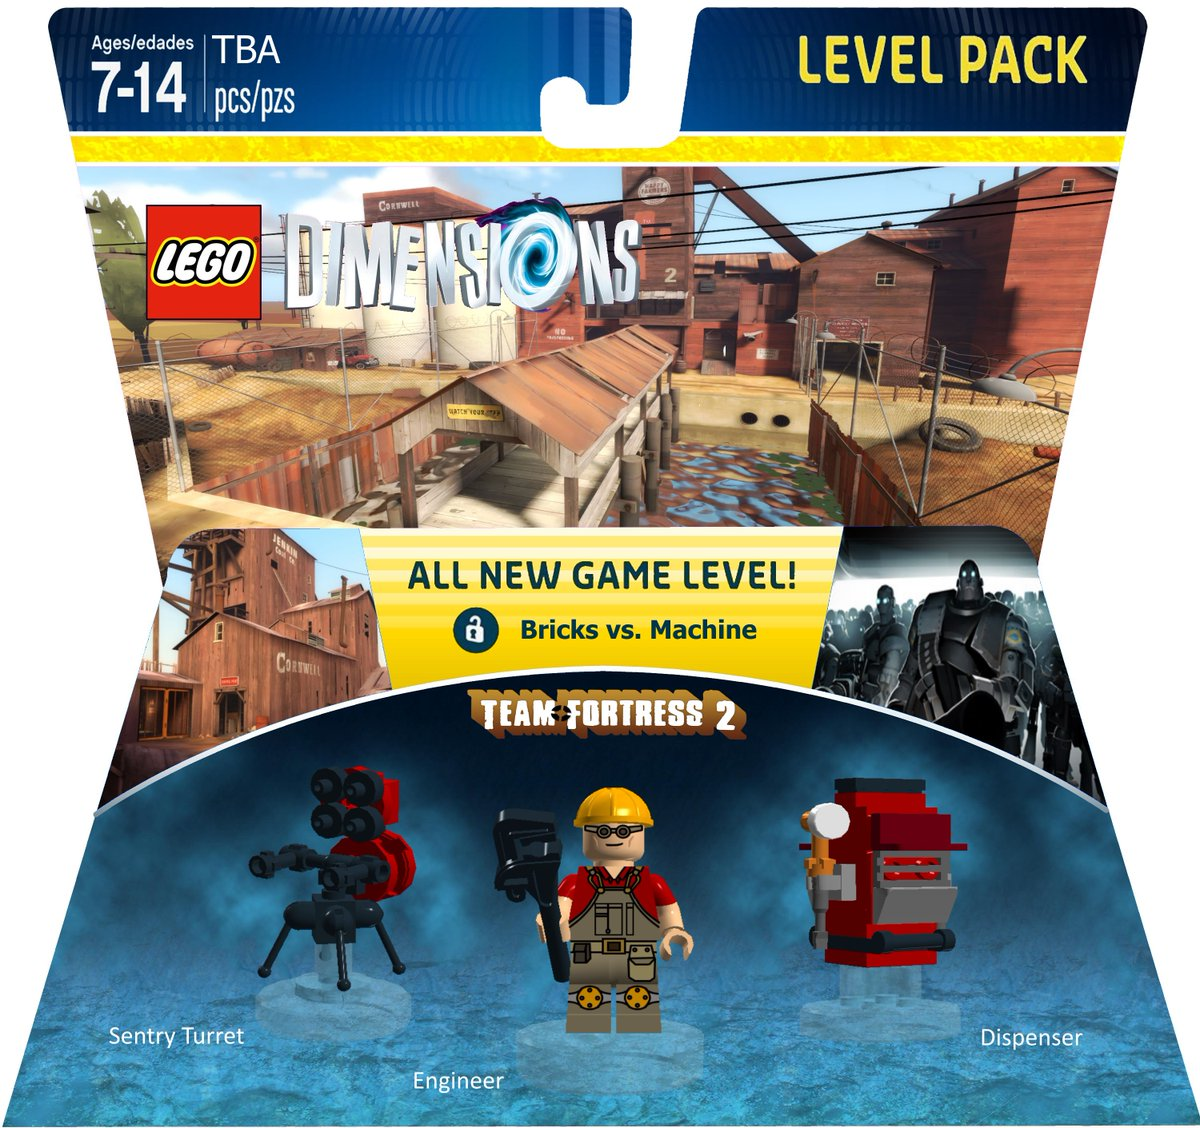 User blog:Xsizter/Team Fortress 2 Level Pack Concept ...